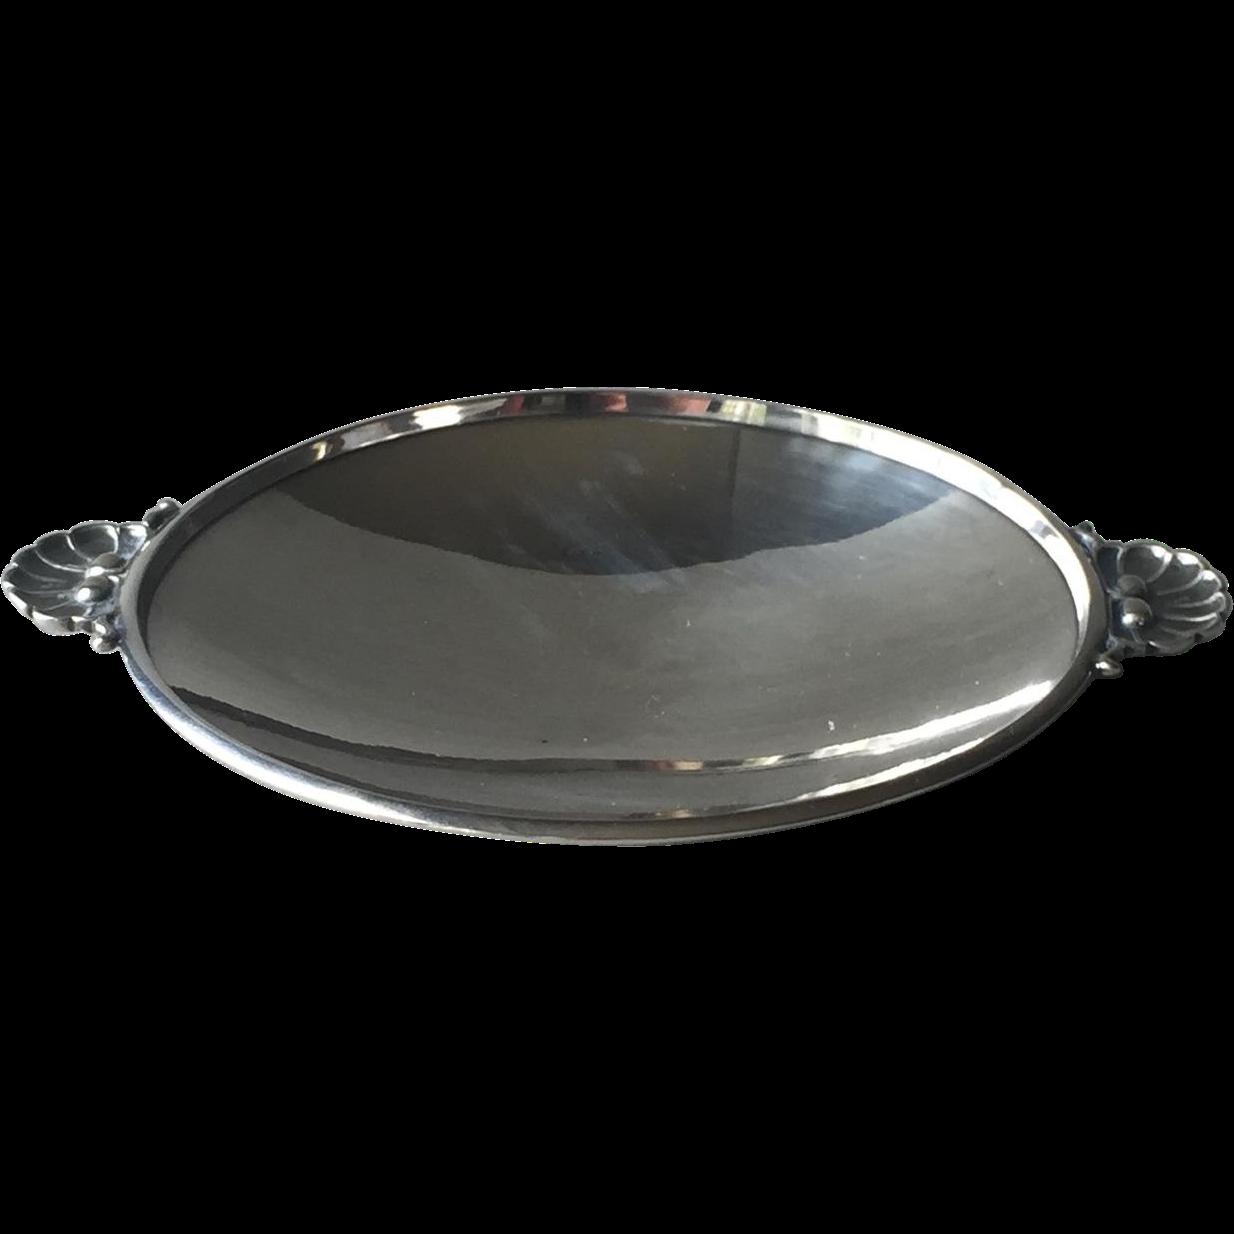 Georg Jensen Sterling Silver Dish No. 355D by Gundorph Albertus